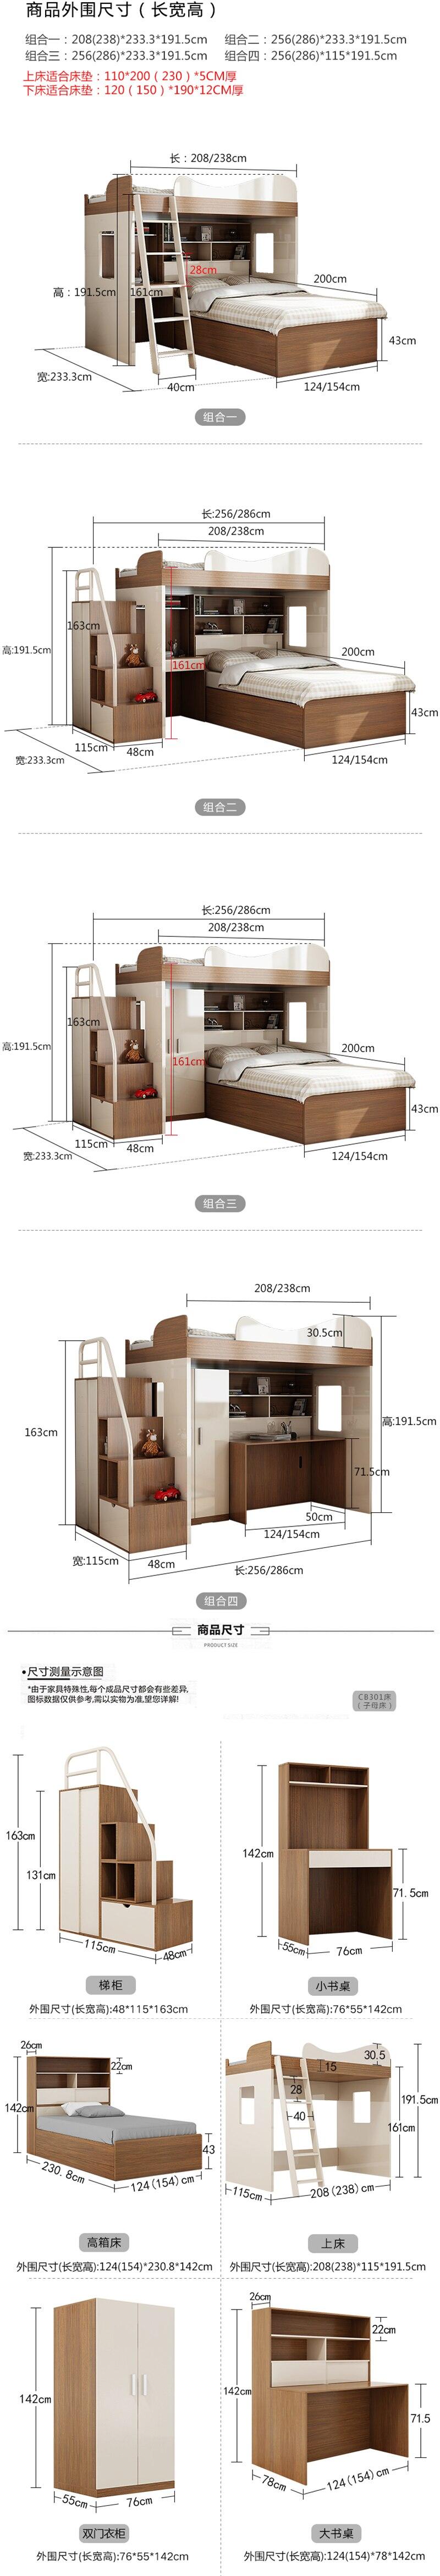 Wohnmöbel Geschickt Maison Zimmer Rahmen Single Kinder Tempat Tidur Tingkat Literas Leder Moderna Mueble De Dormitorio Schlafzimmer Möbel Cama Bett